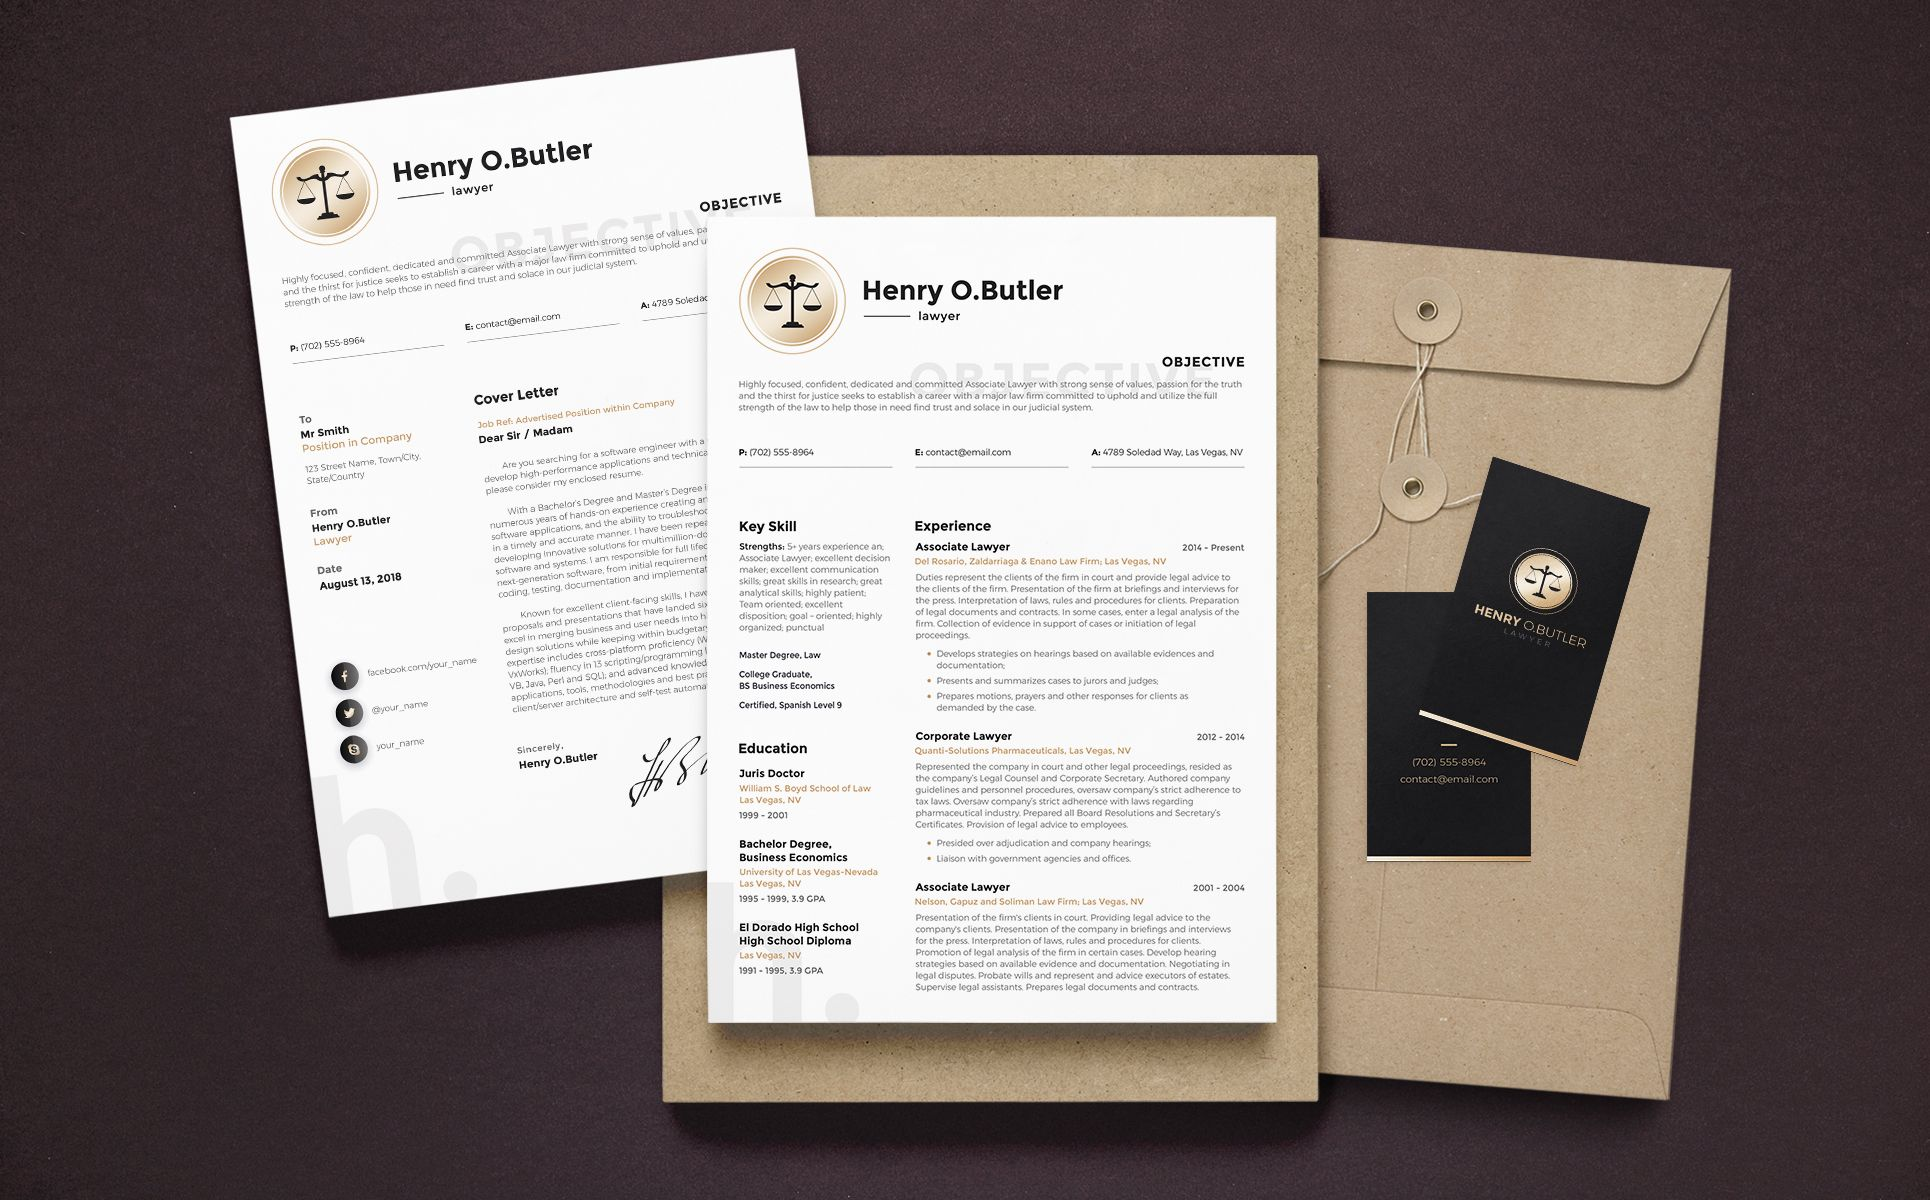 Henry O. Butler - Lawyer Resume Template | design | Resume ...